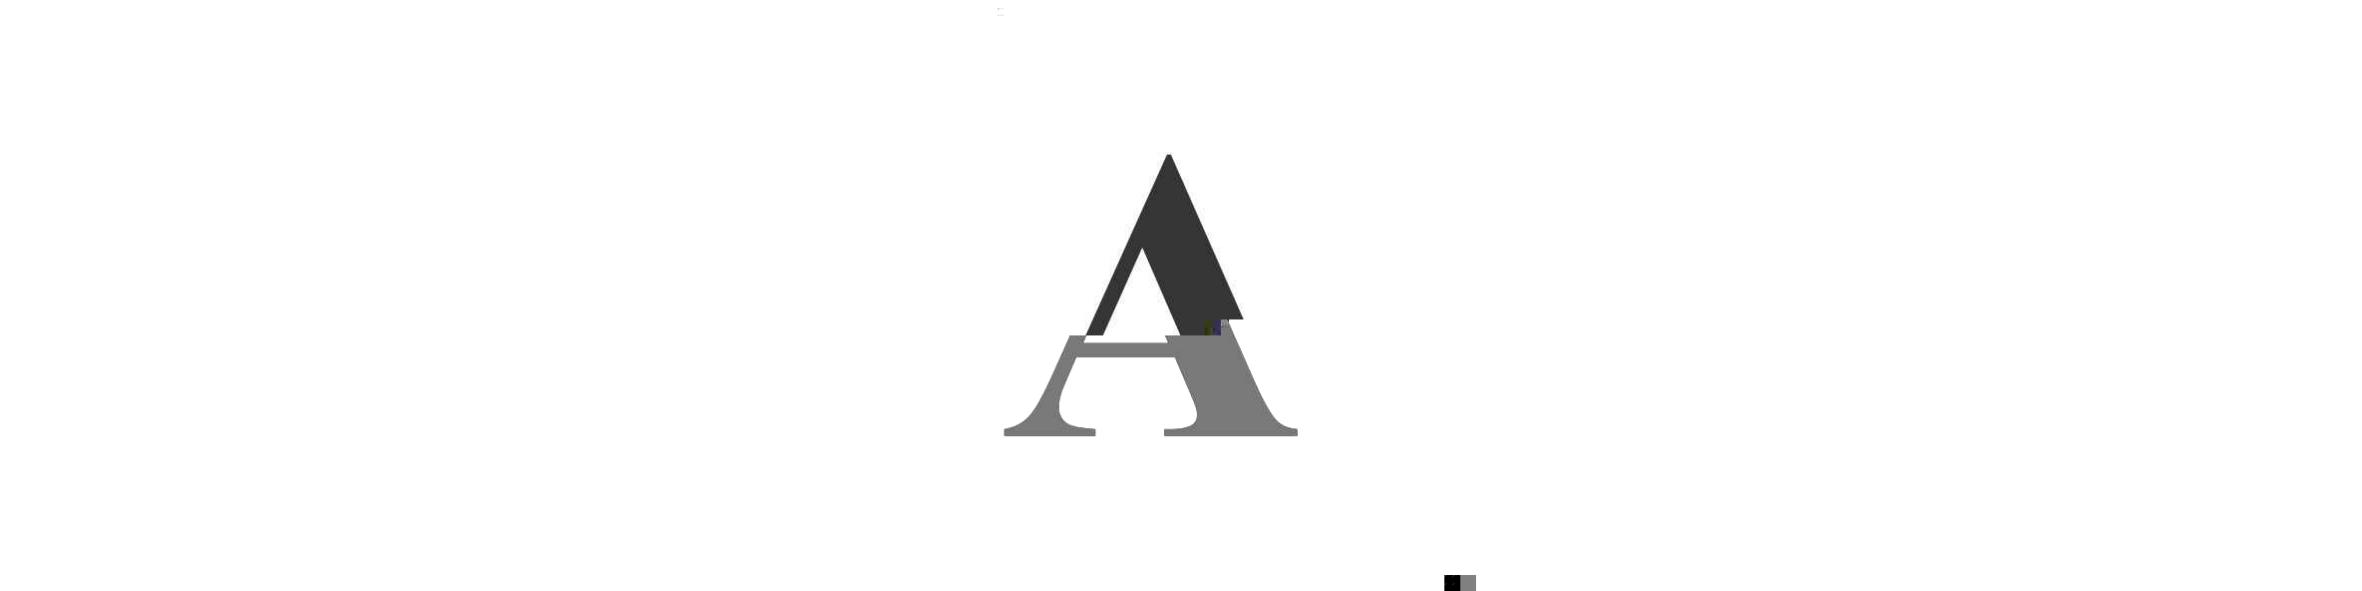 Archivolat Header Image